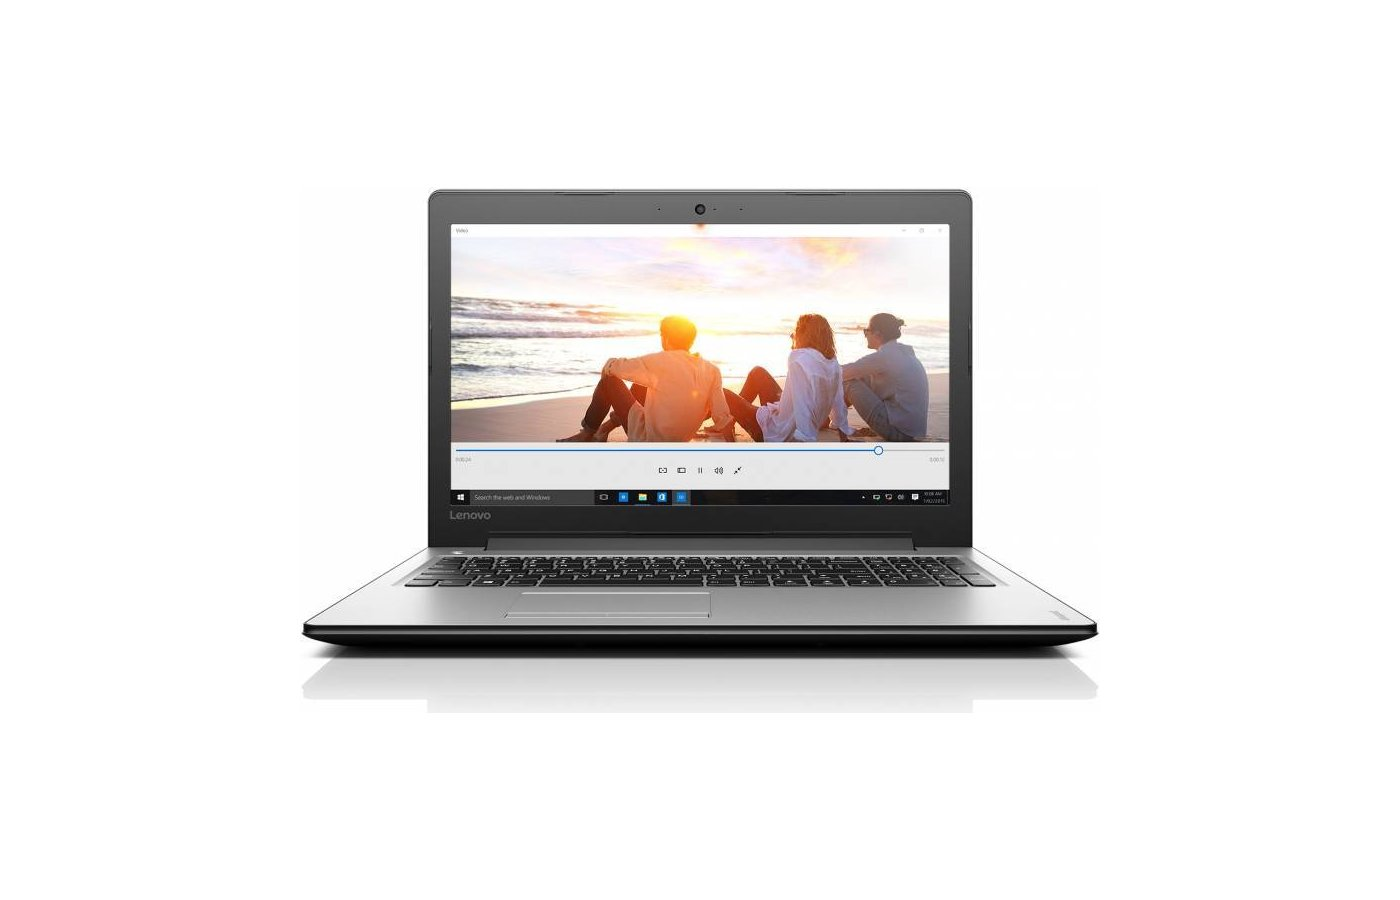 Ноутбук Lenovo IdeaPad 300-15ISK /80Q701JVRK/ intel i5 6200U/6Gb/1Tb/R5 2Gb/15.6/WiFi/Win10